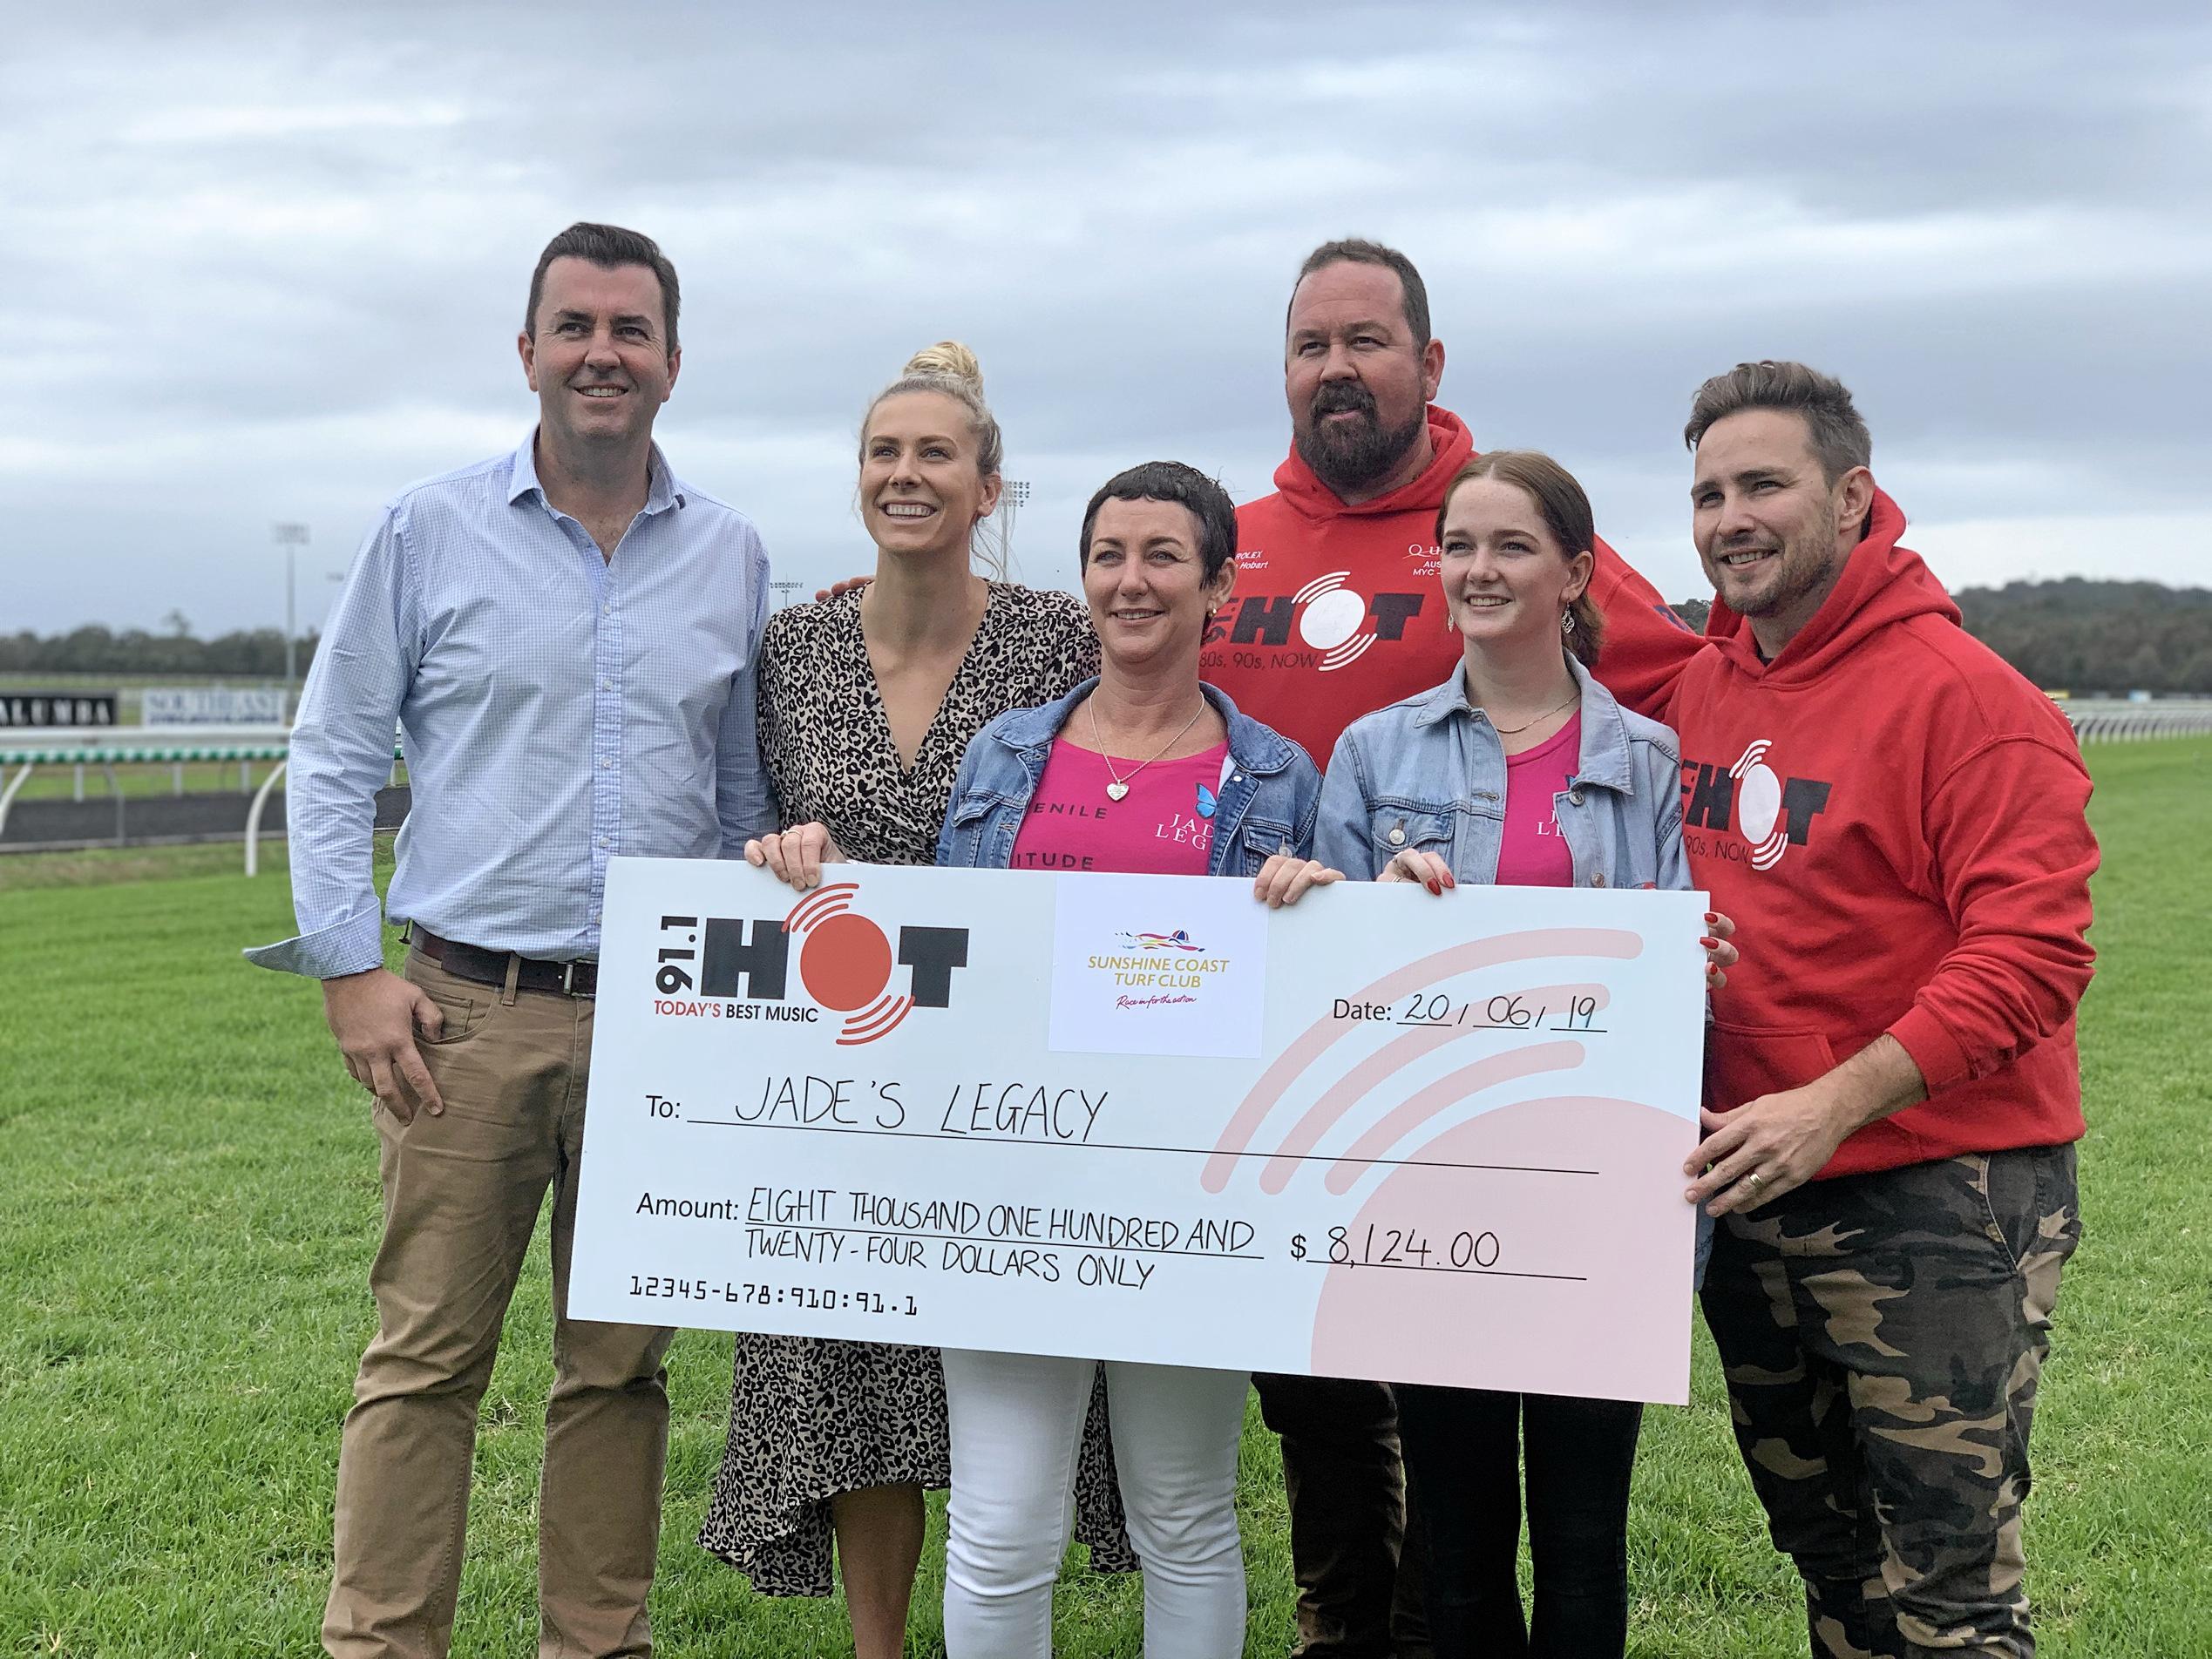 Hot 91 Breakfast Team presented a cheque of $8,124 to Jade's Legacy on June 20.  John Miller, Ash Gierke, Julie Dixson, Sam Coward, Georgia Dixson and Dave Matthews.